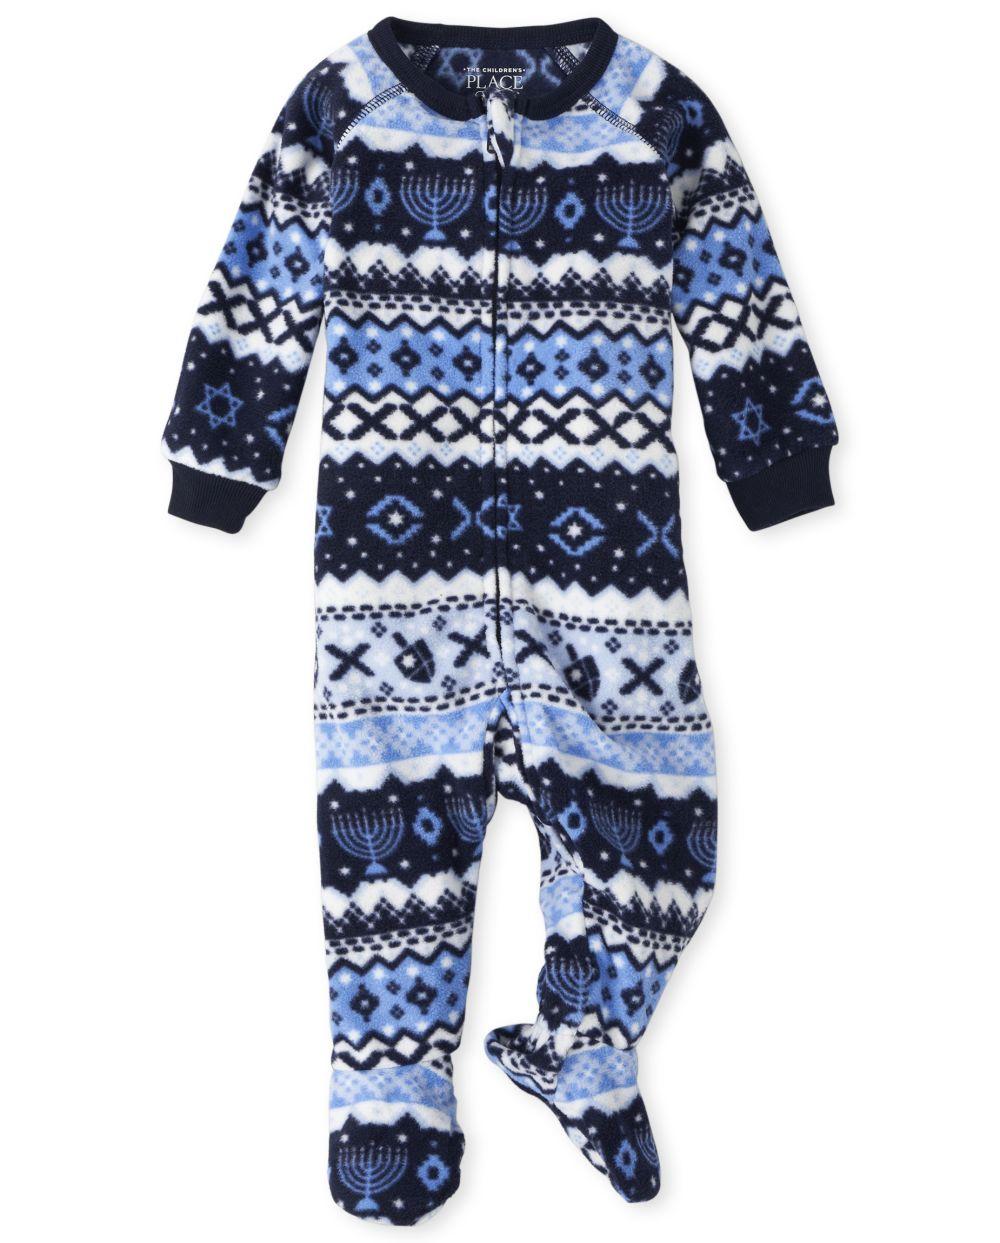 Unisex Baby And Toddler Matching Family Hanukkah Fairisle Fleece One Piece Pajamas